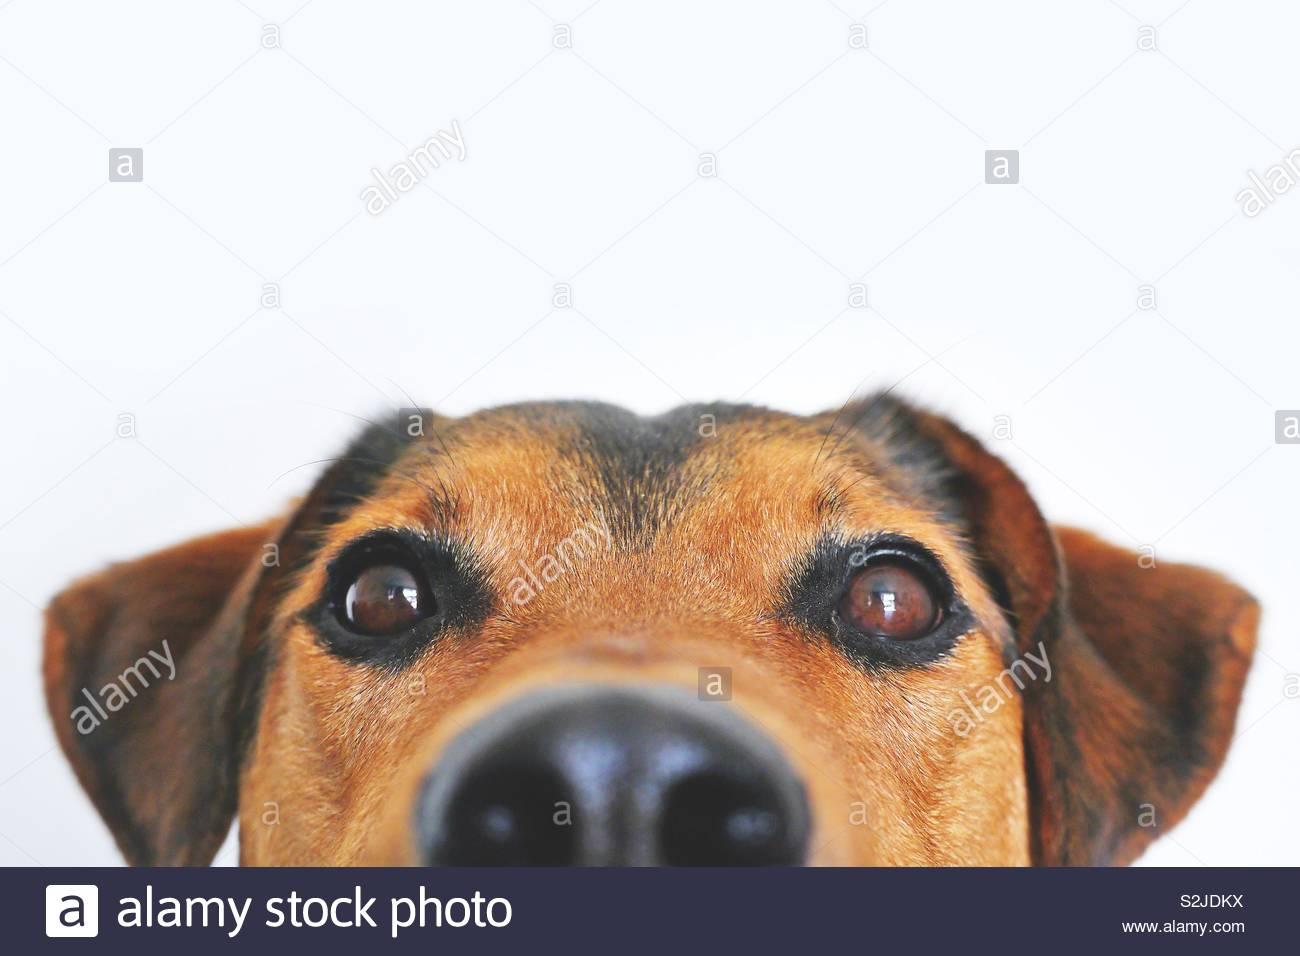 Our dog Tilda - my son's screensaver pic - always makes me smile! - Stock Image